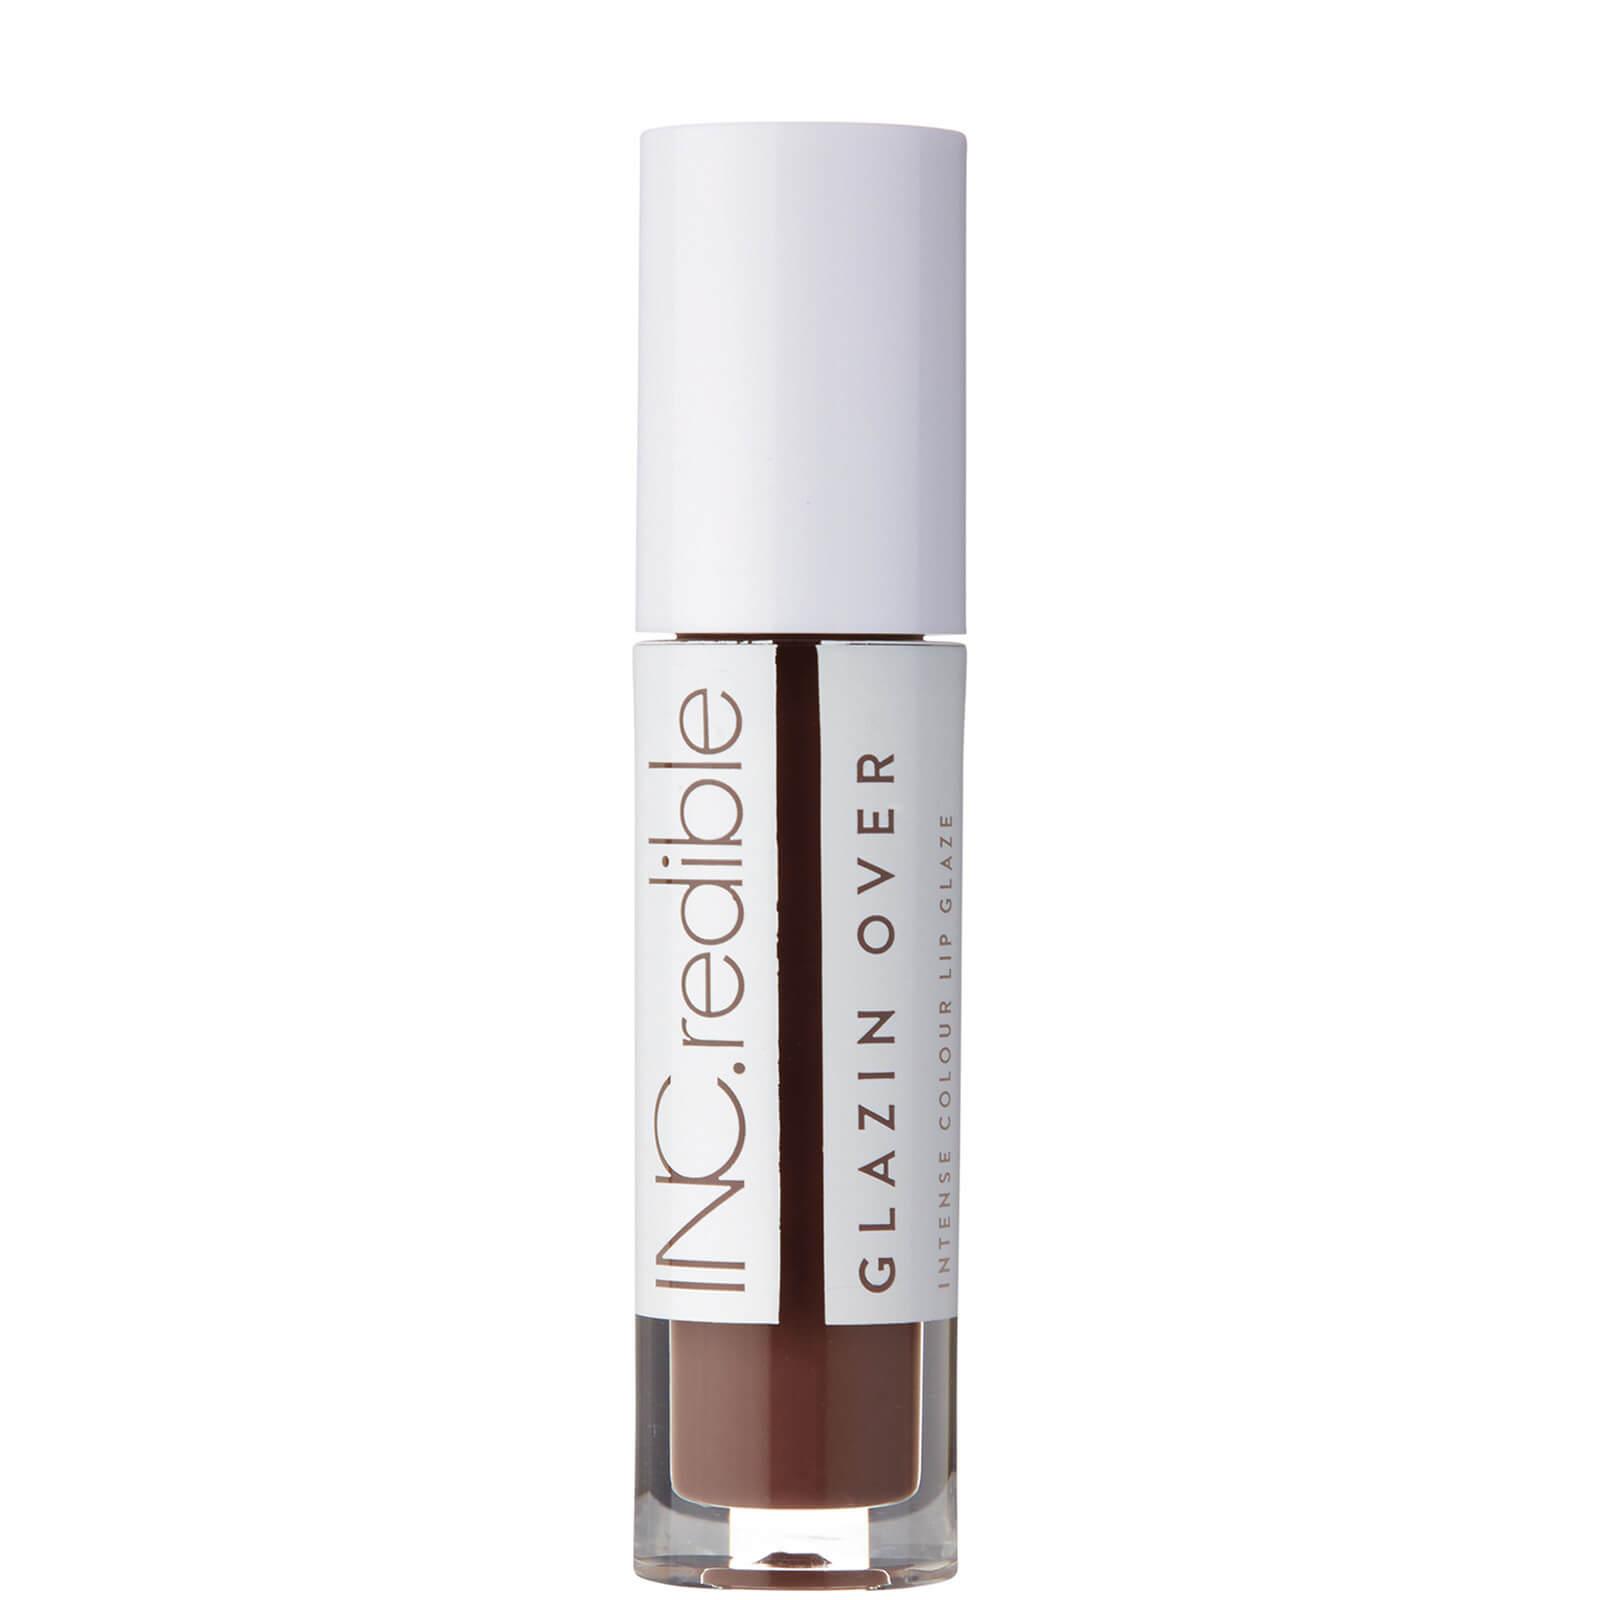 INC.redible Glazin Over gloss labbra (varie tonalità) - Oh Hey There